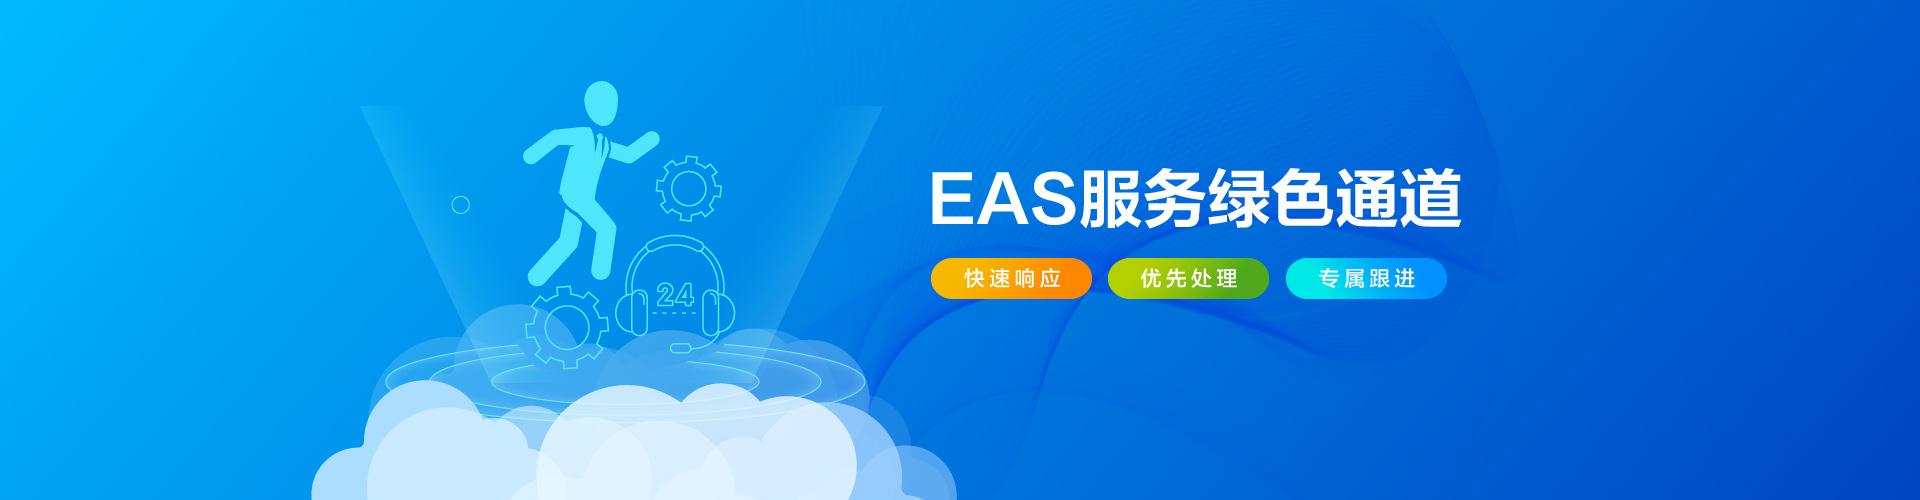 EAS服務綠色通道